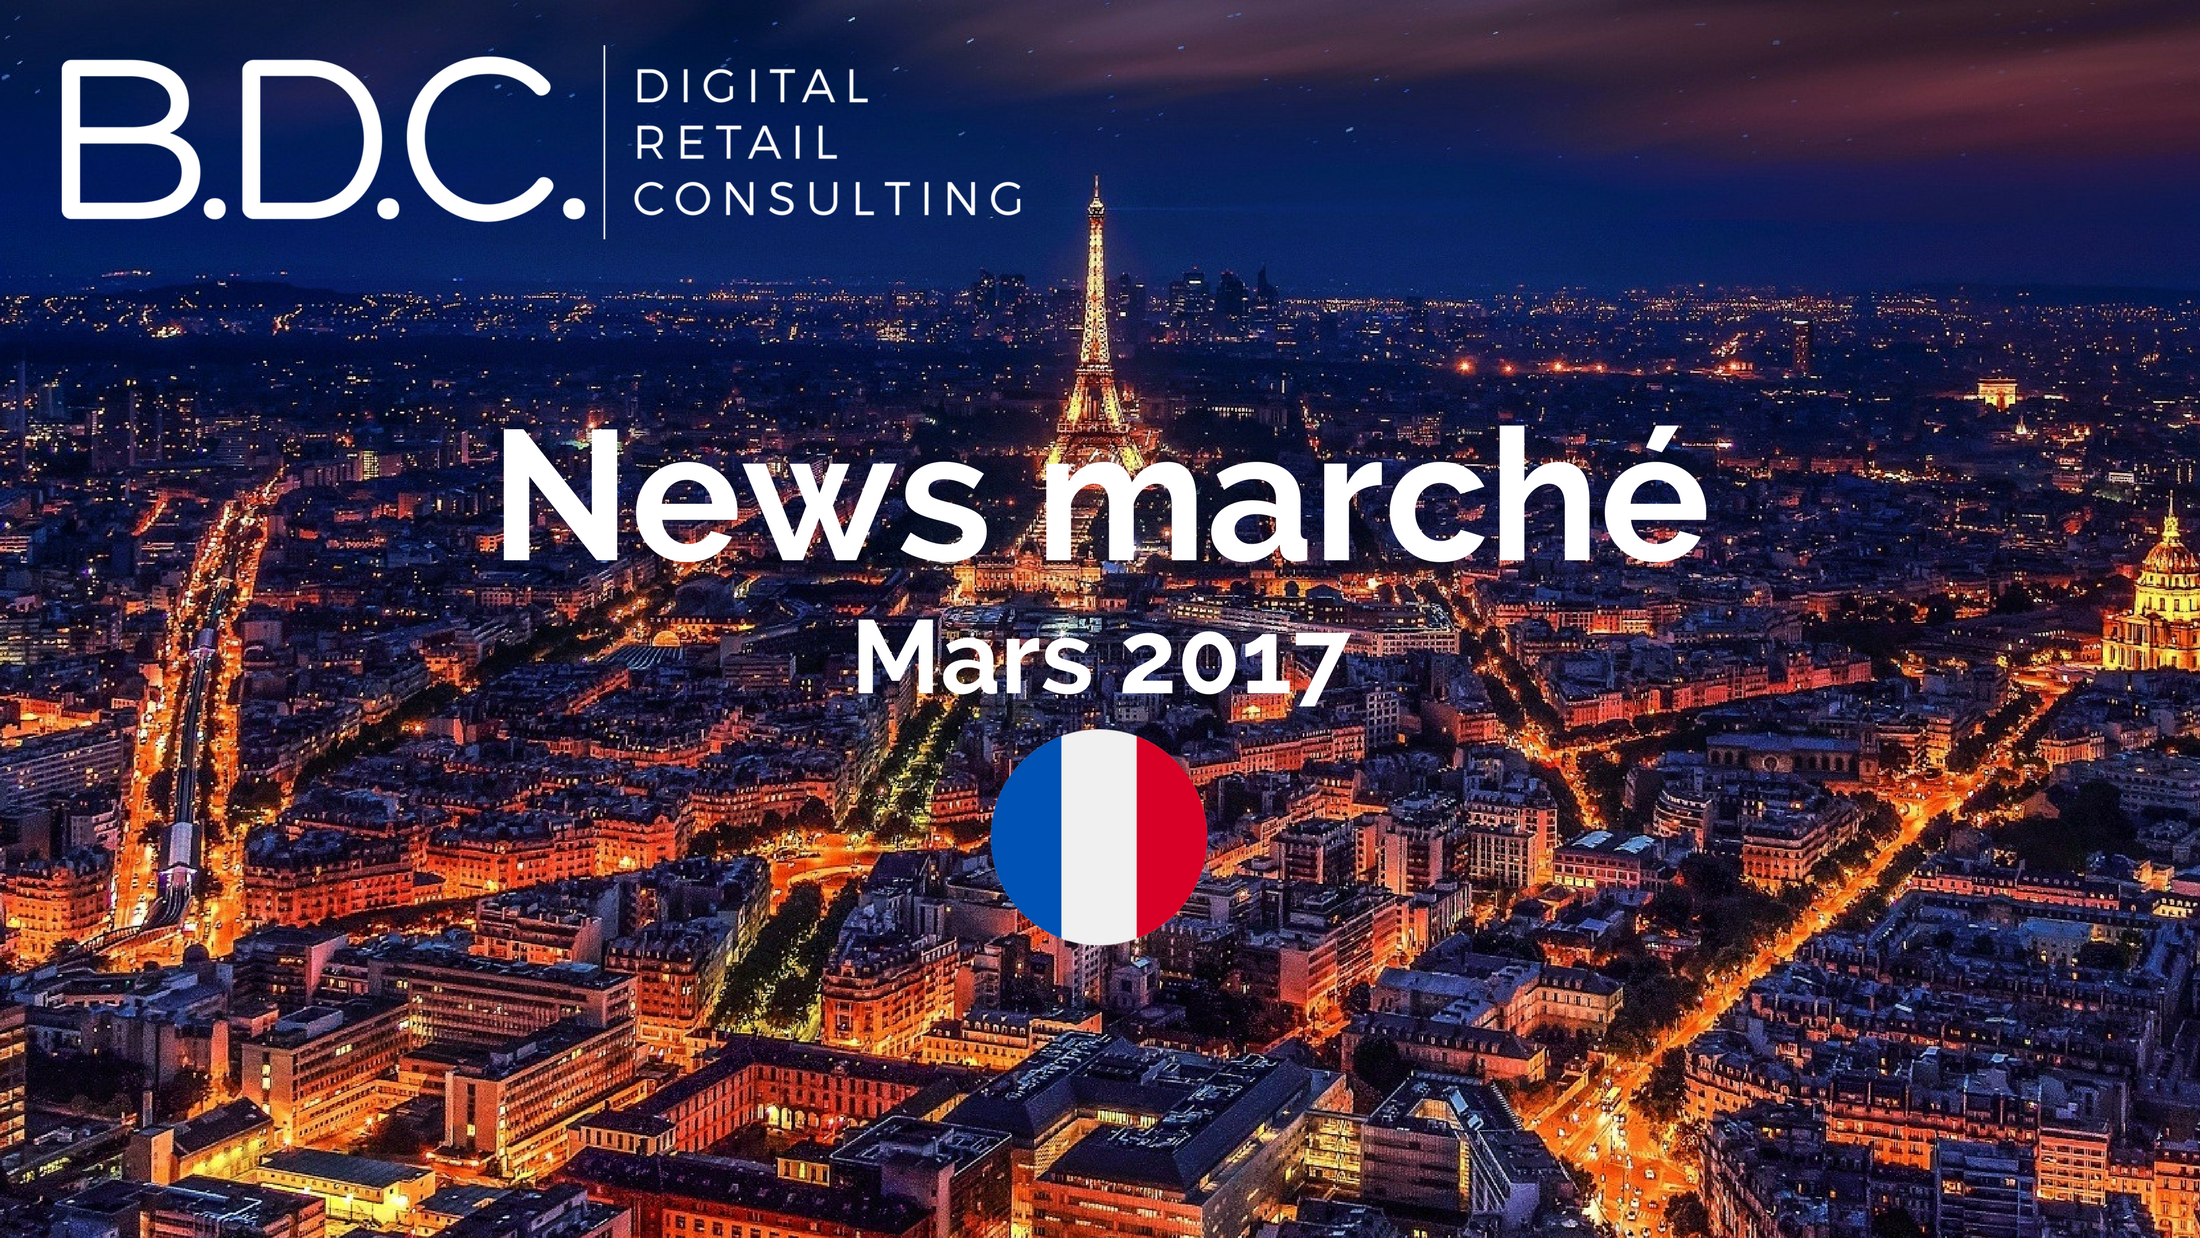 Trends News 3 - NEWS MARCHÉ – MARS 2017